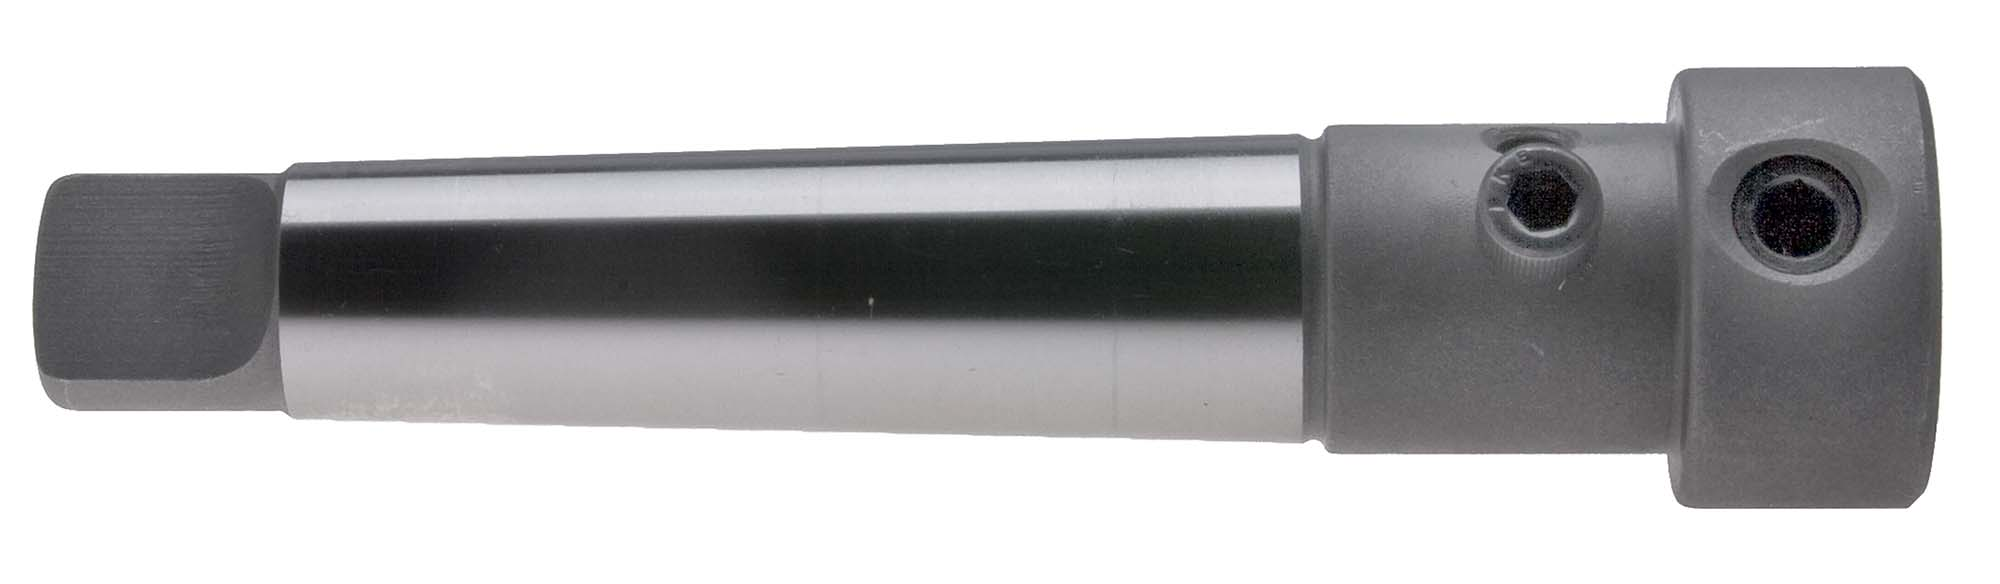 2 Morse Taper Annular Cutter Holder